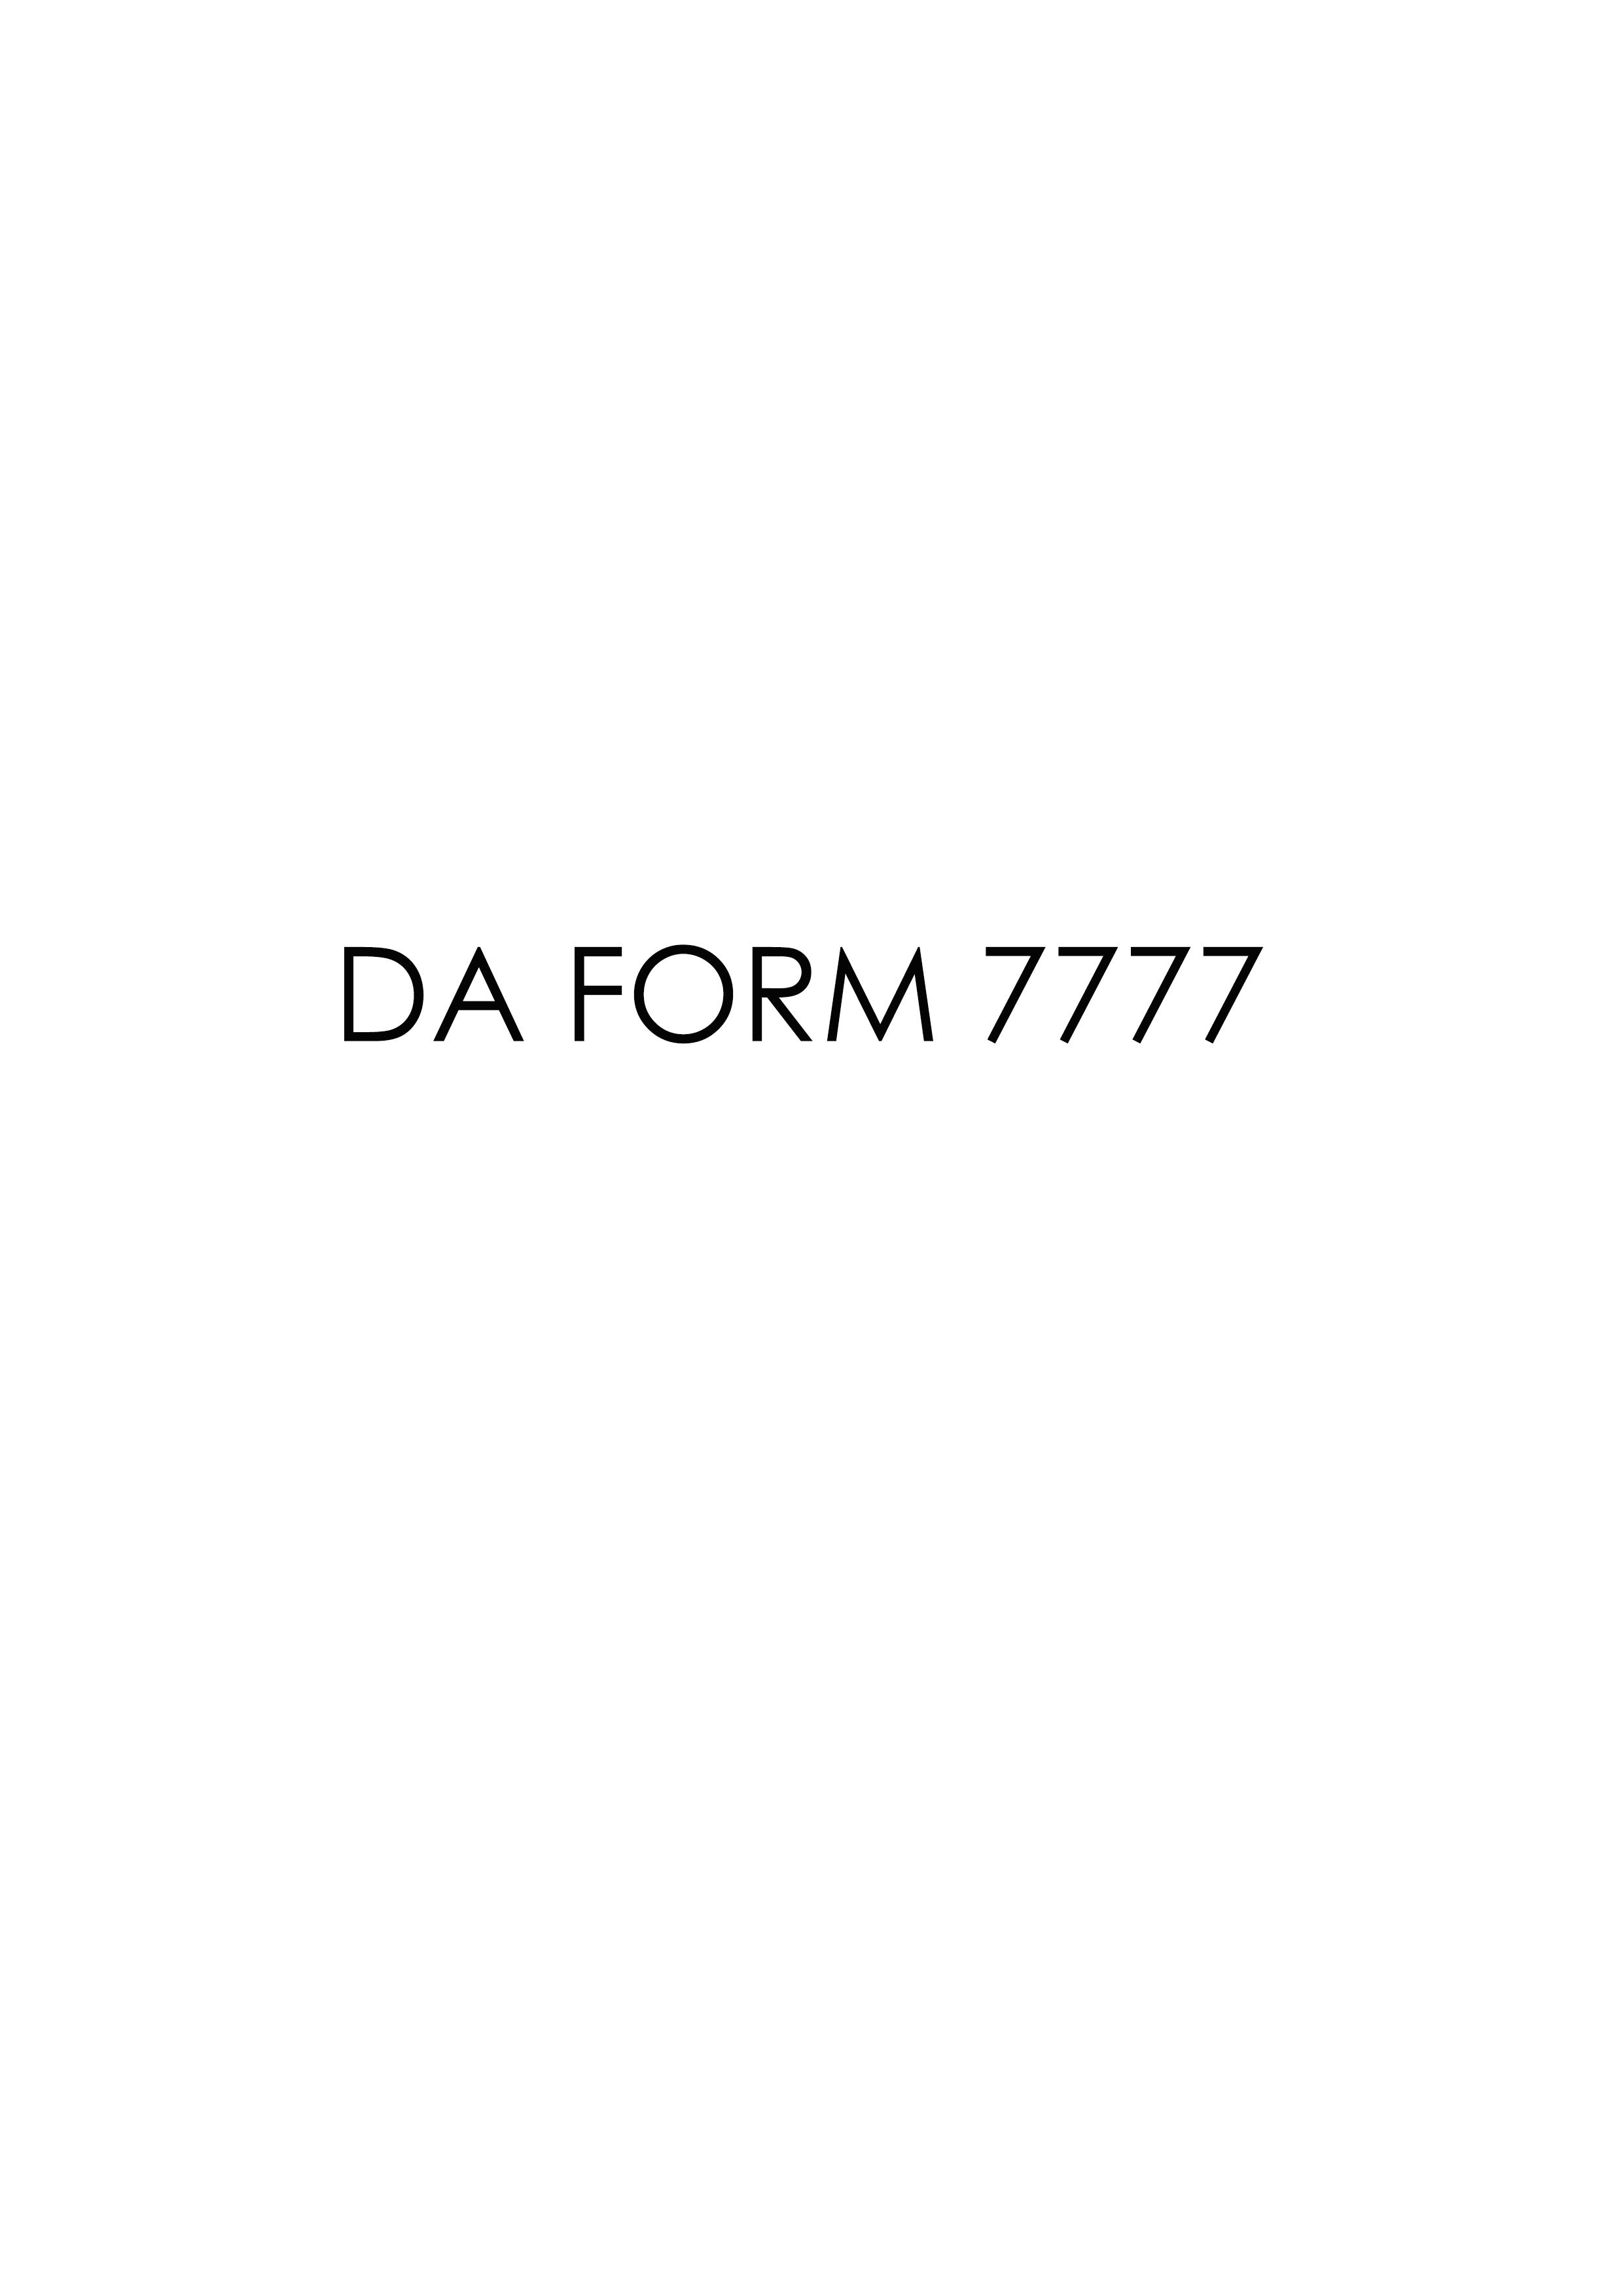 Download da Form 7777 Free